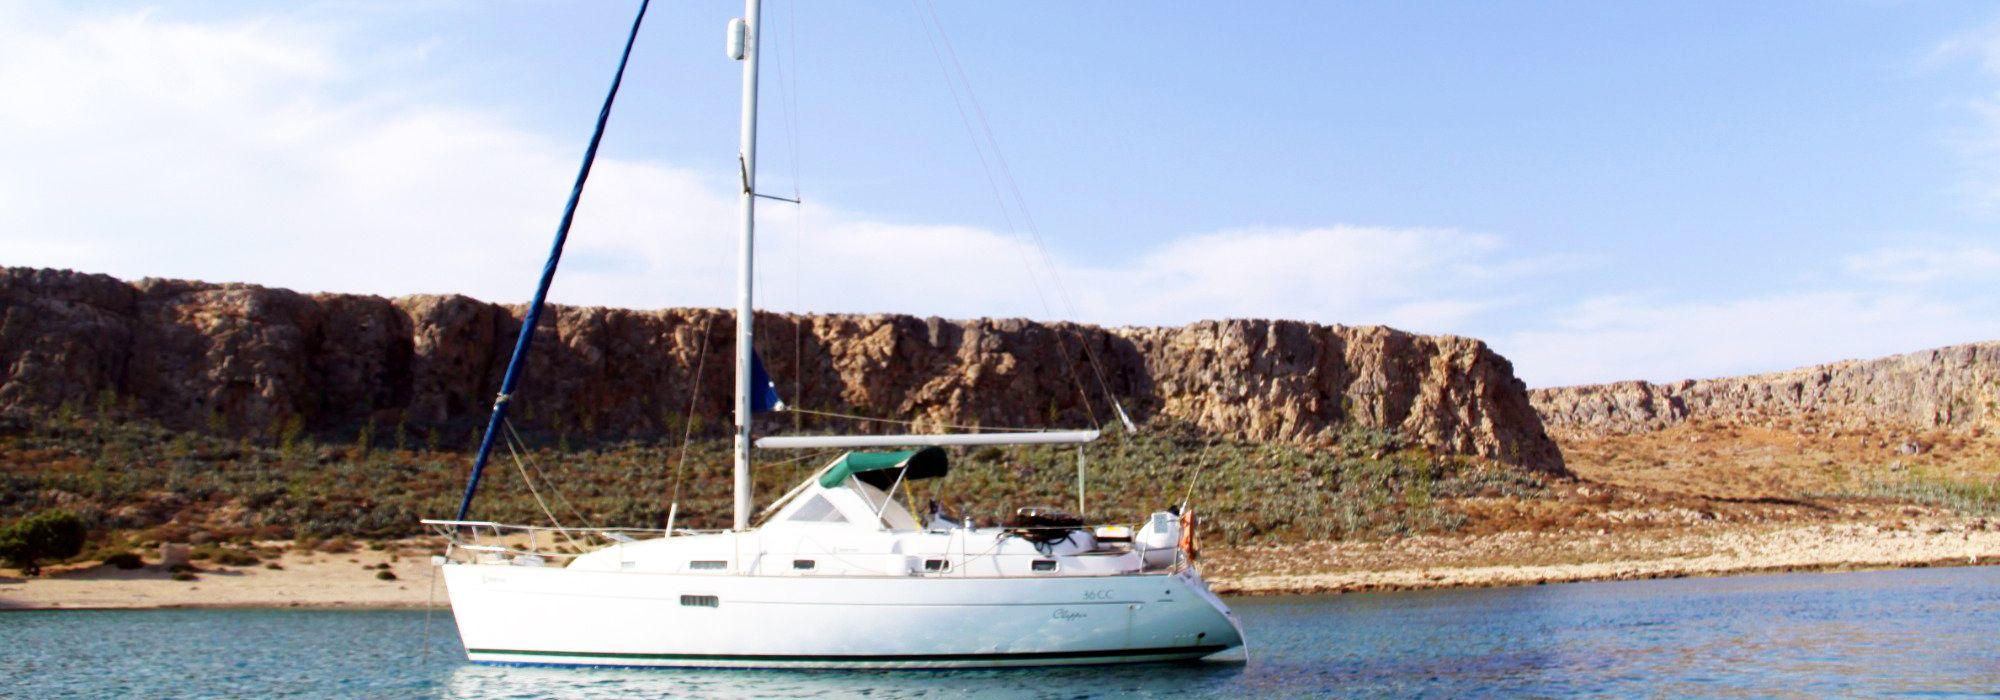 Enjoy a daily sailing boat cruise